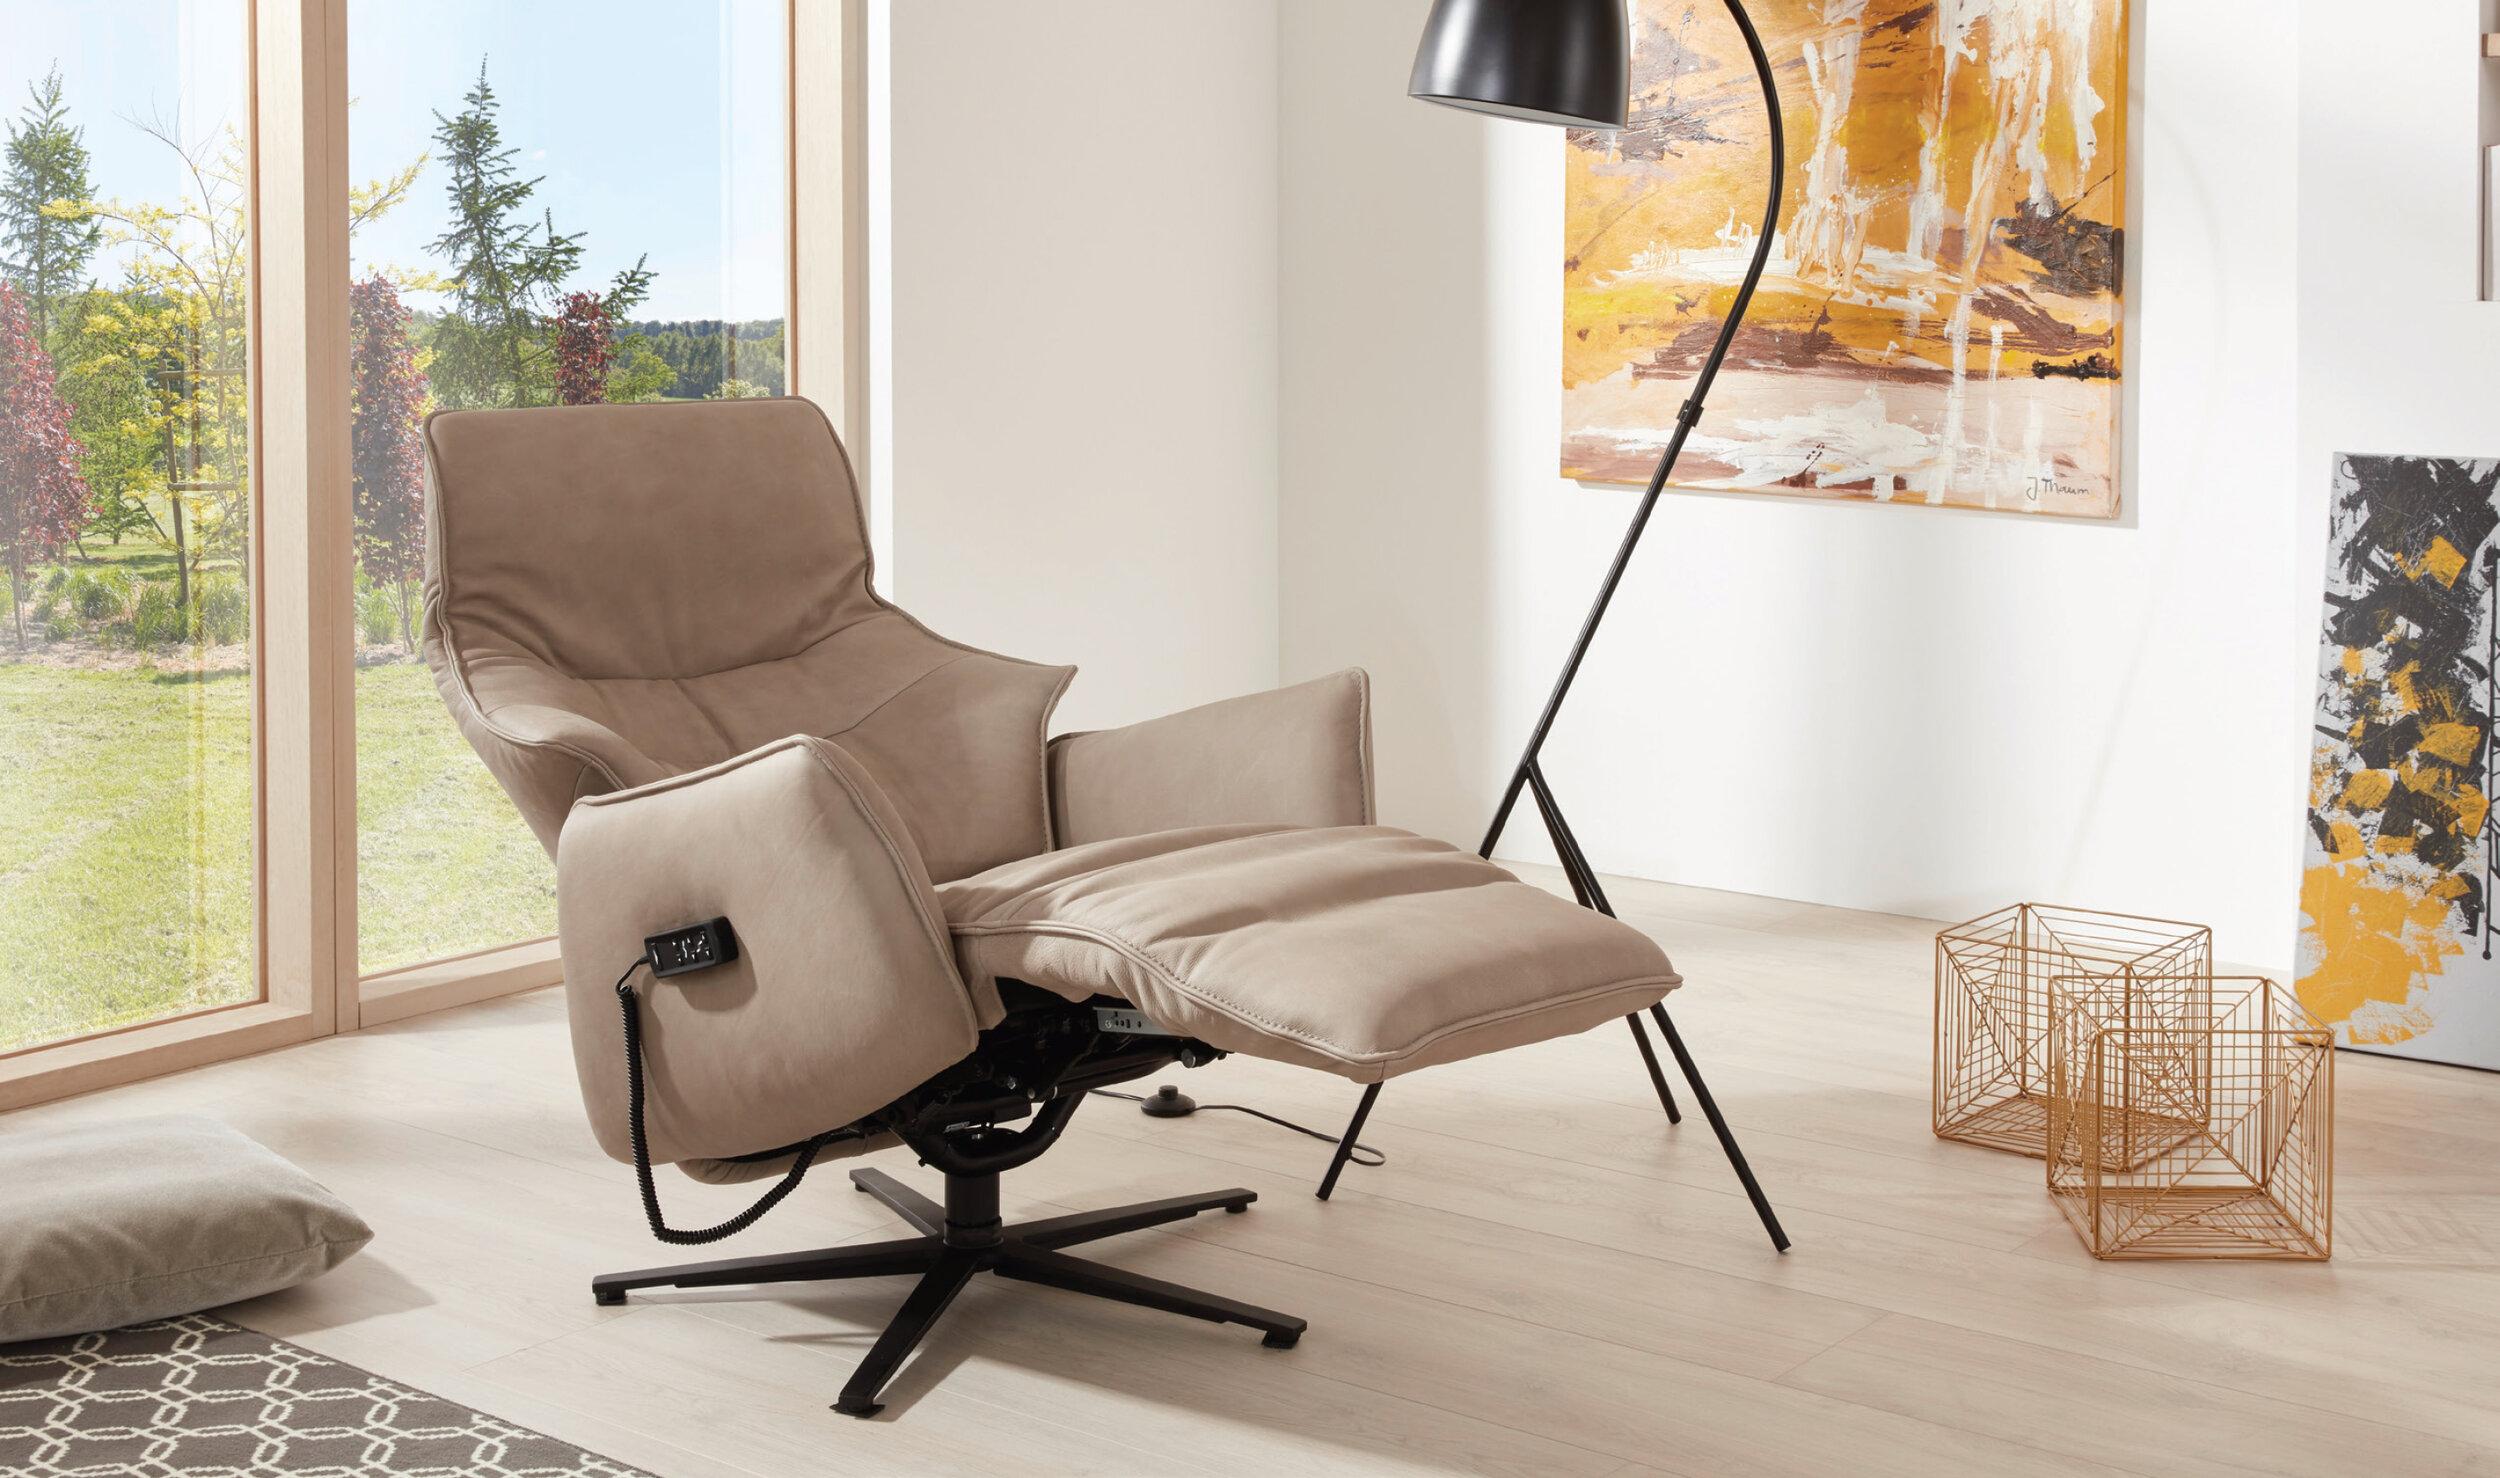 Himolla-Seine-recliner.jpg